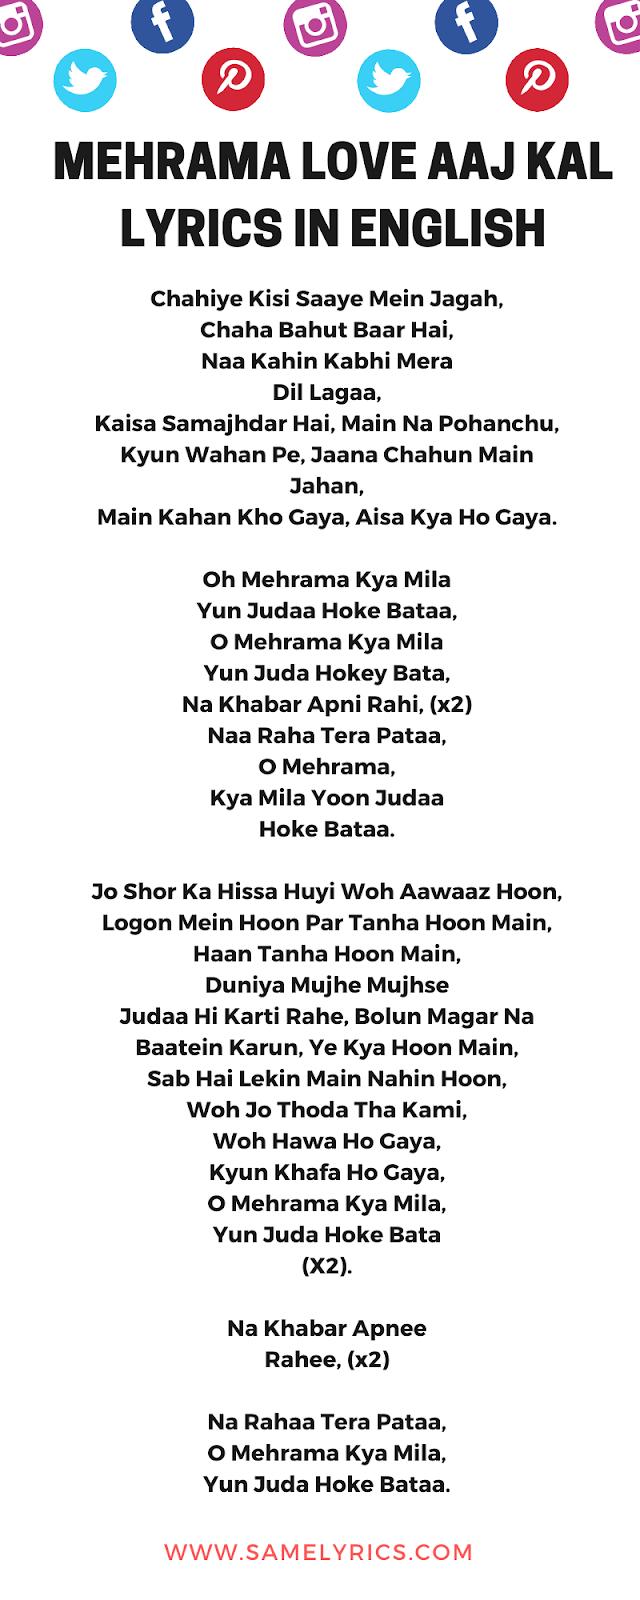 Mehrama Love Aaj Kal Lyrics In English